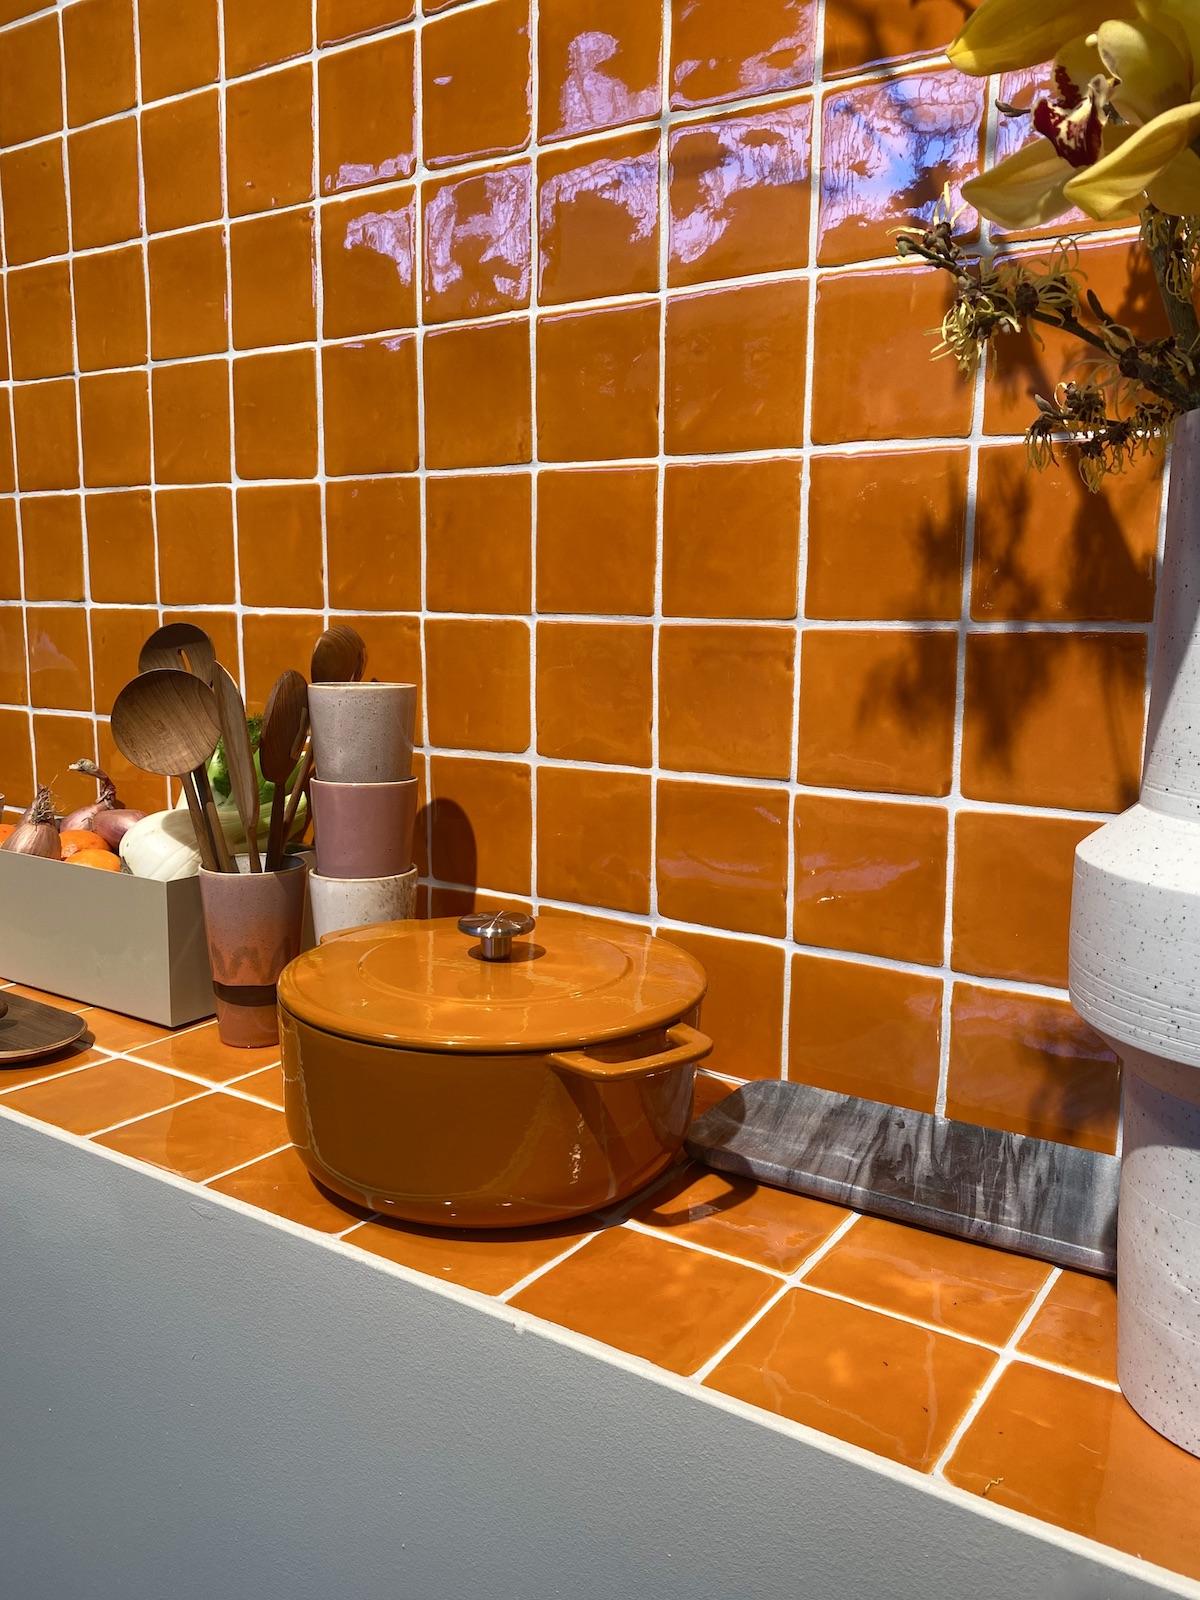 cuisine carrelage orange terracotta carré zellige design traditionnel